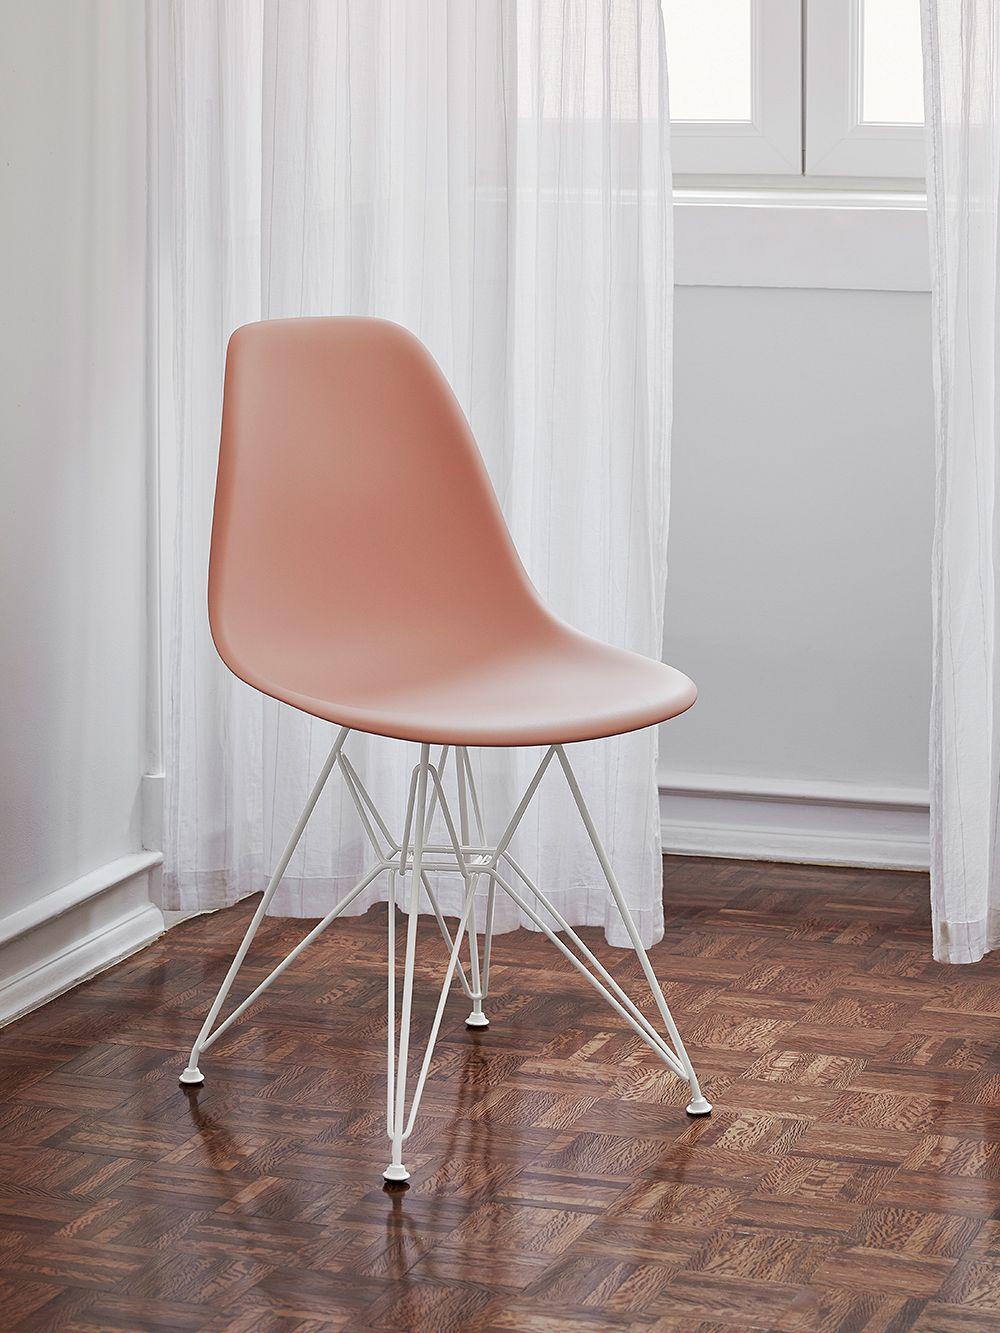 Vitra Eames DSR tuoli, pale rose - valkoinen